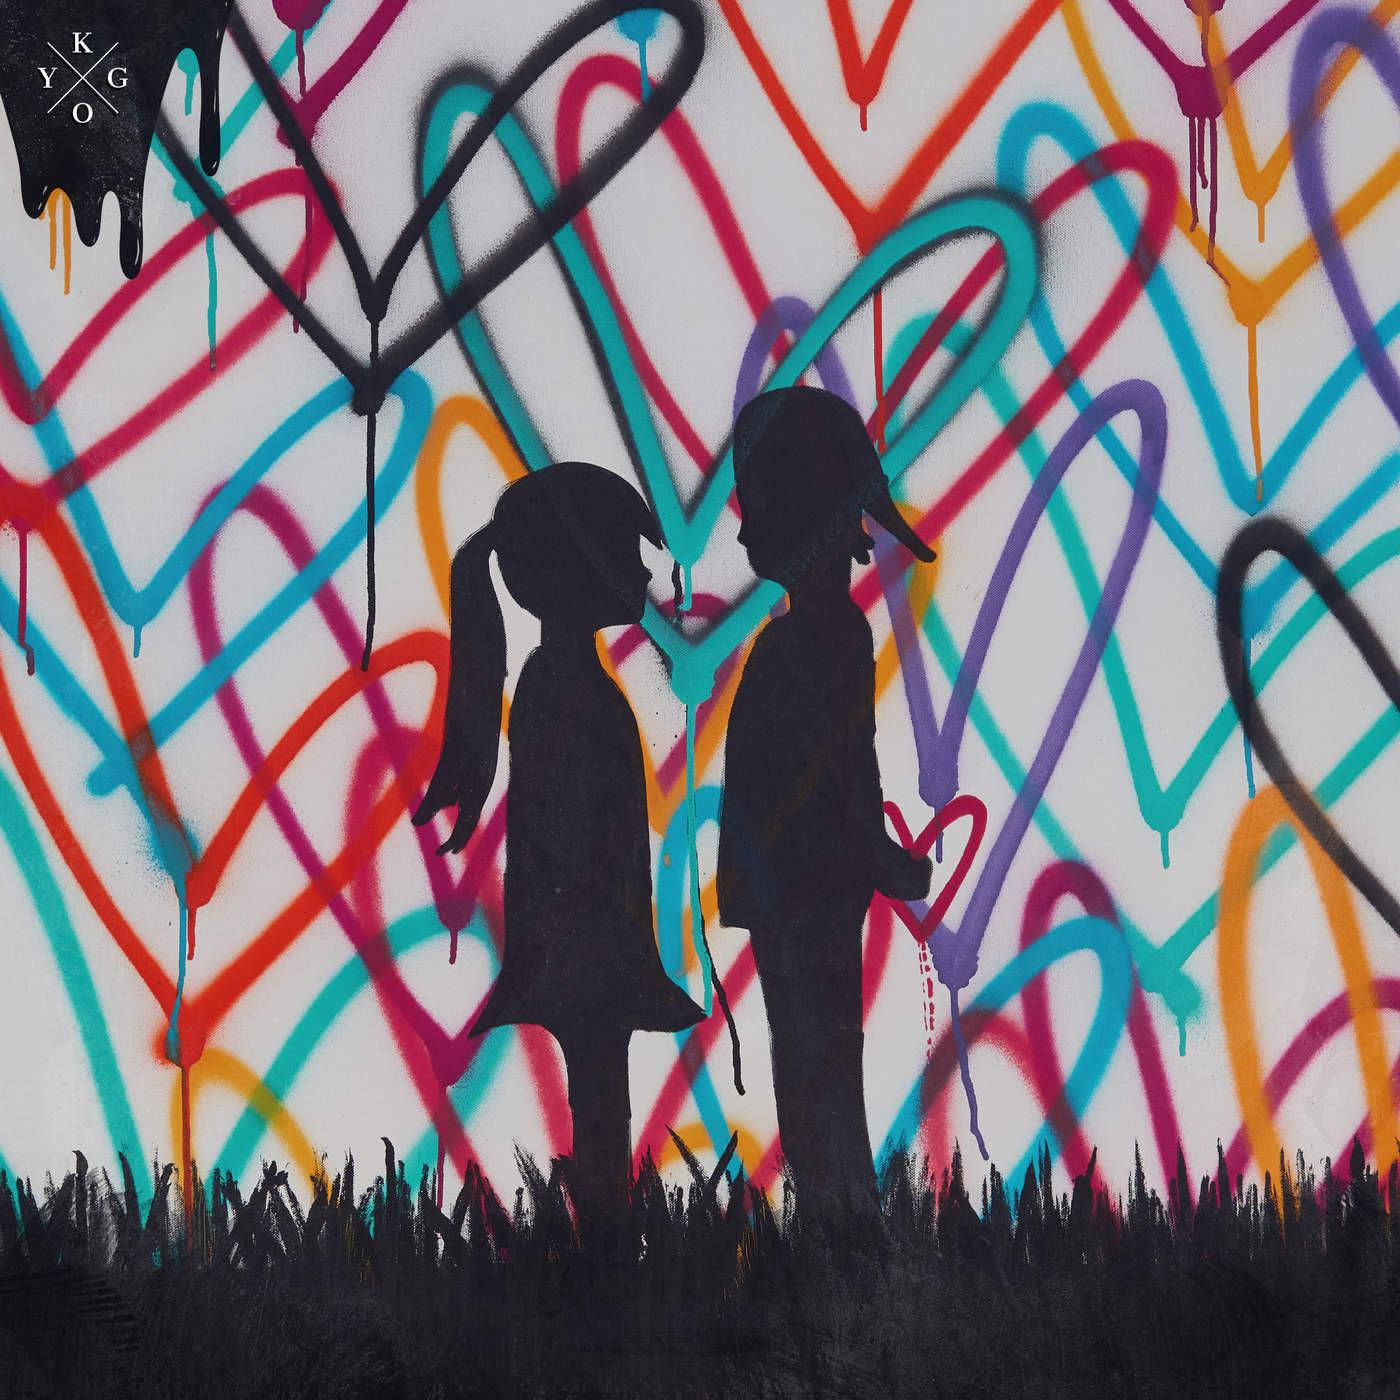 Kygo - Never Let You Go (feat. John Newman) - Single